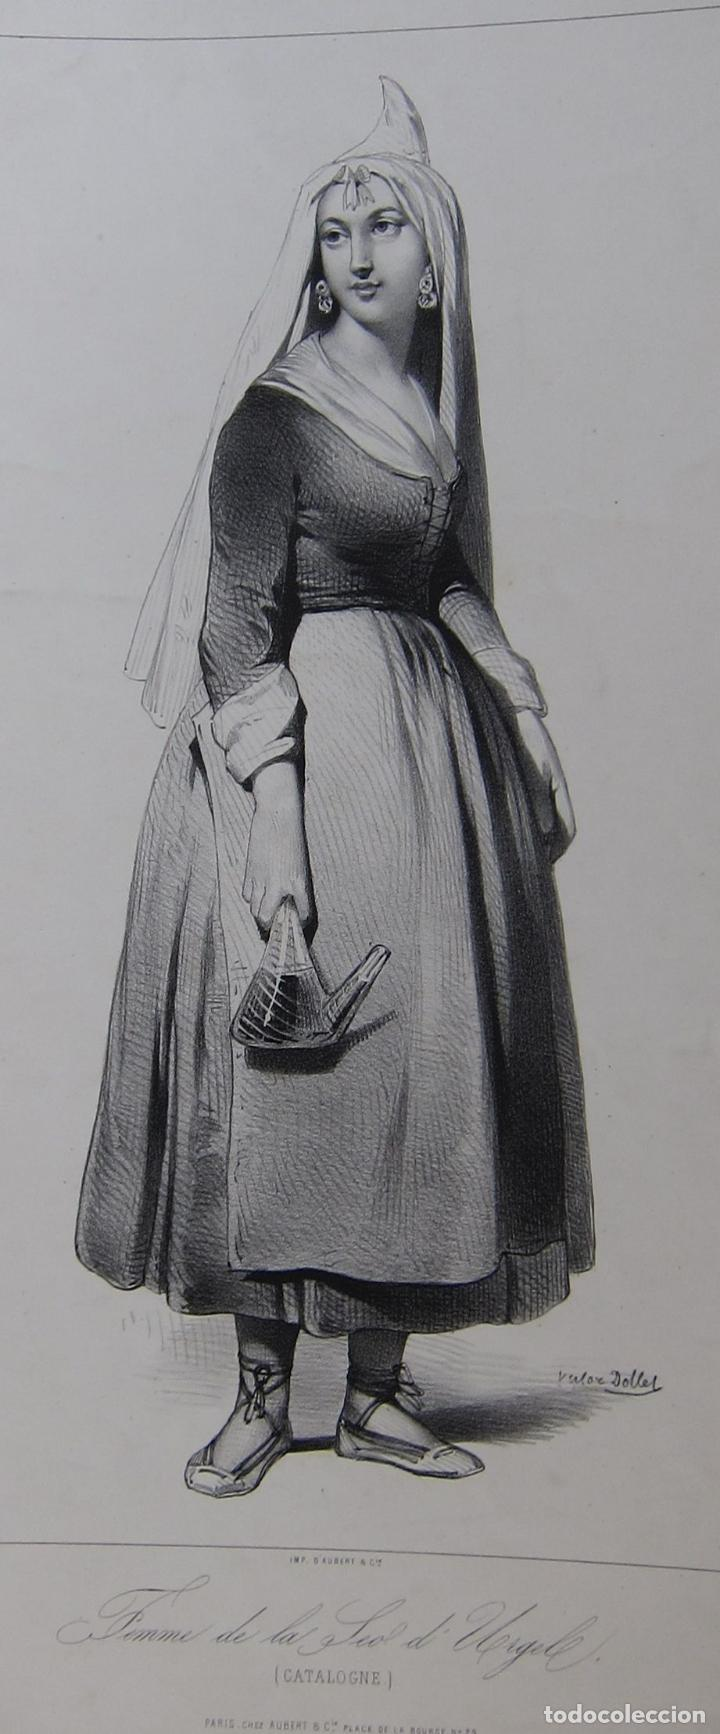 FEMME DE LA SEU D'URGELL. CATALOGNE. DIBUJO DE PHARAMOND BLANCHARD. LITOGRAFIA DOLLET. PARÍS, 1842 (Arte - Litografías)